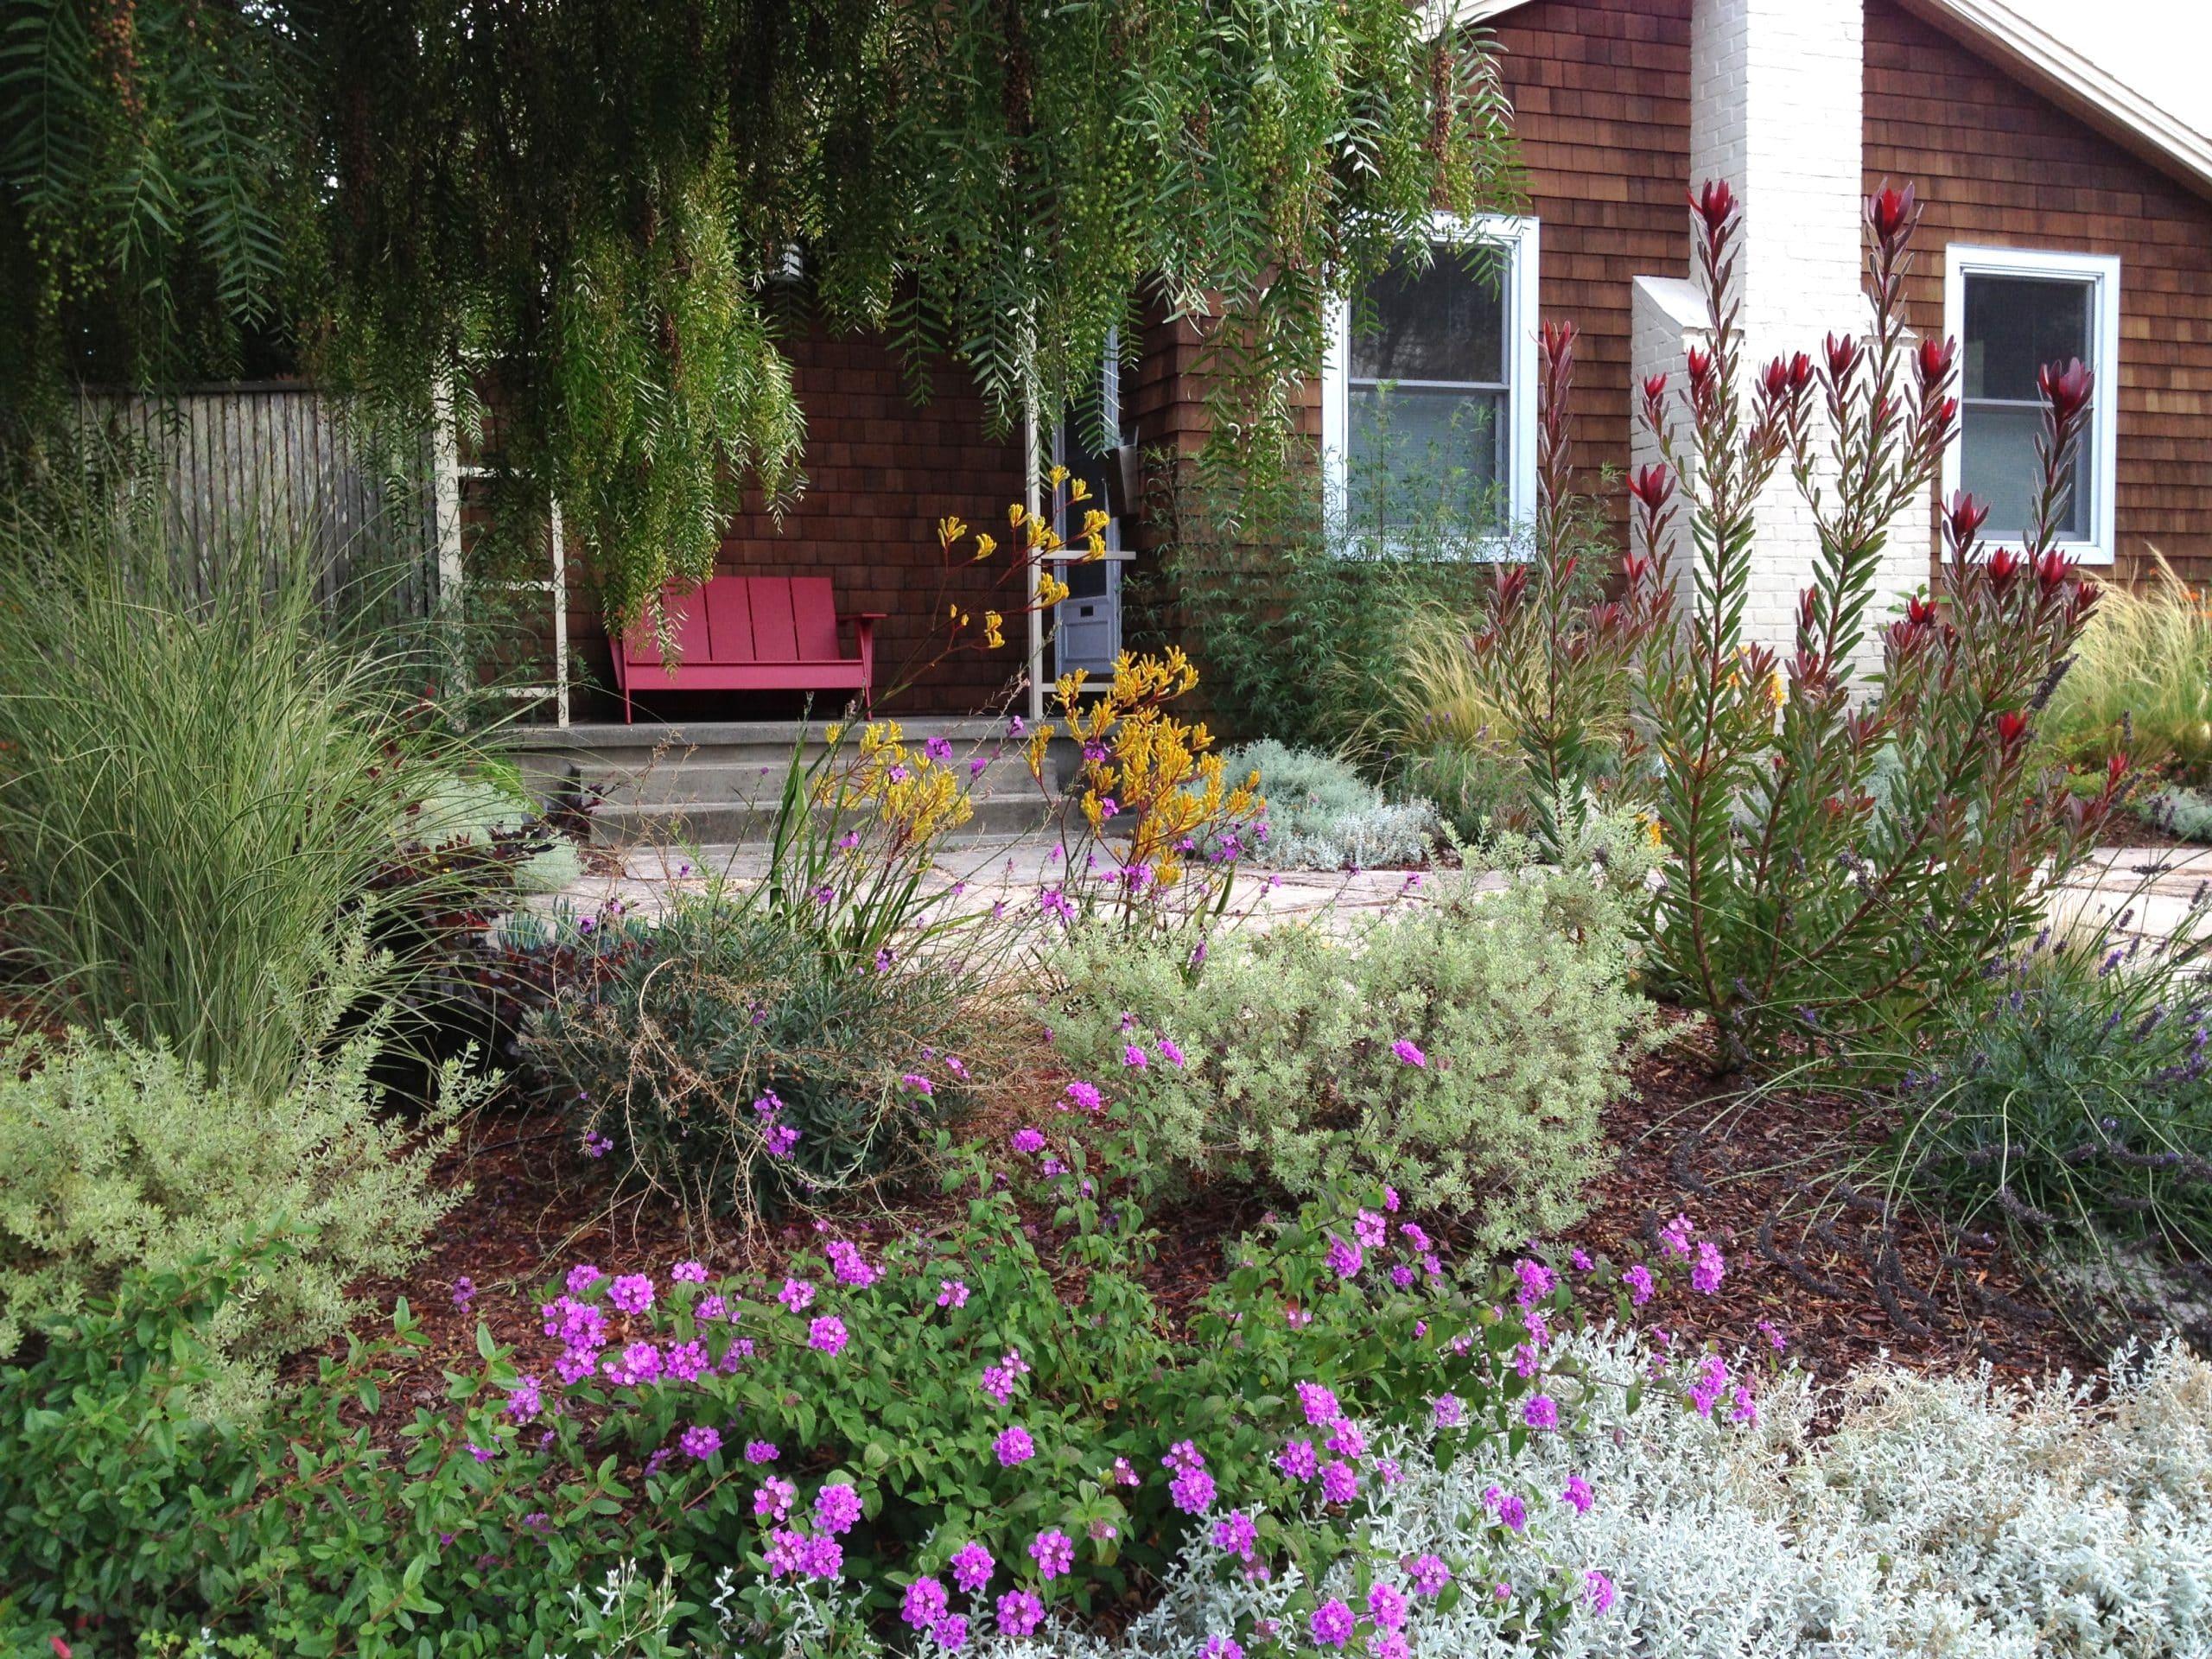 Garden design department sloat garden center for Garden design mill valley